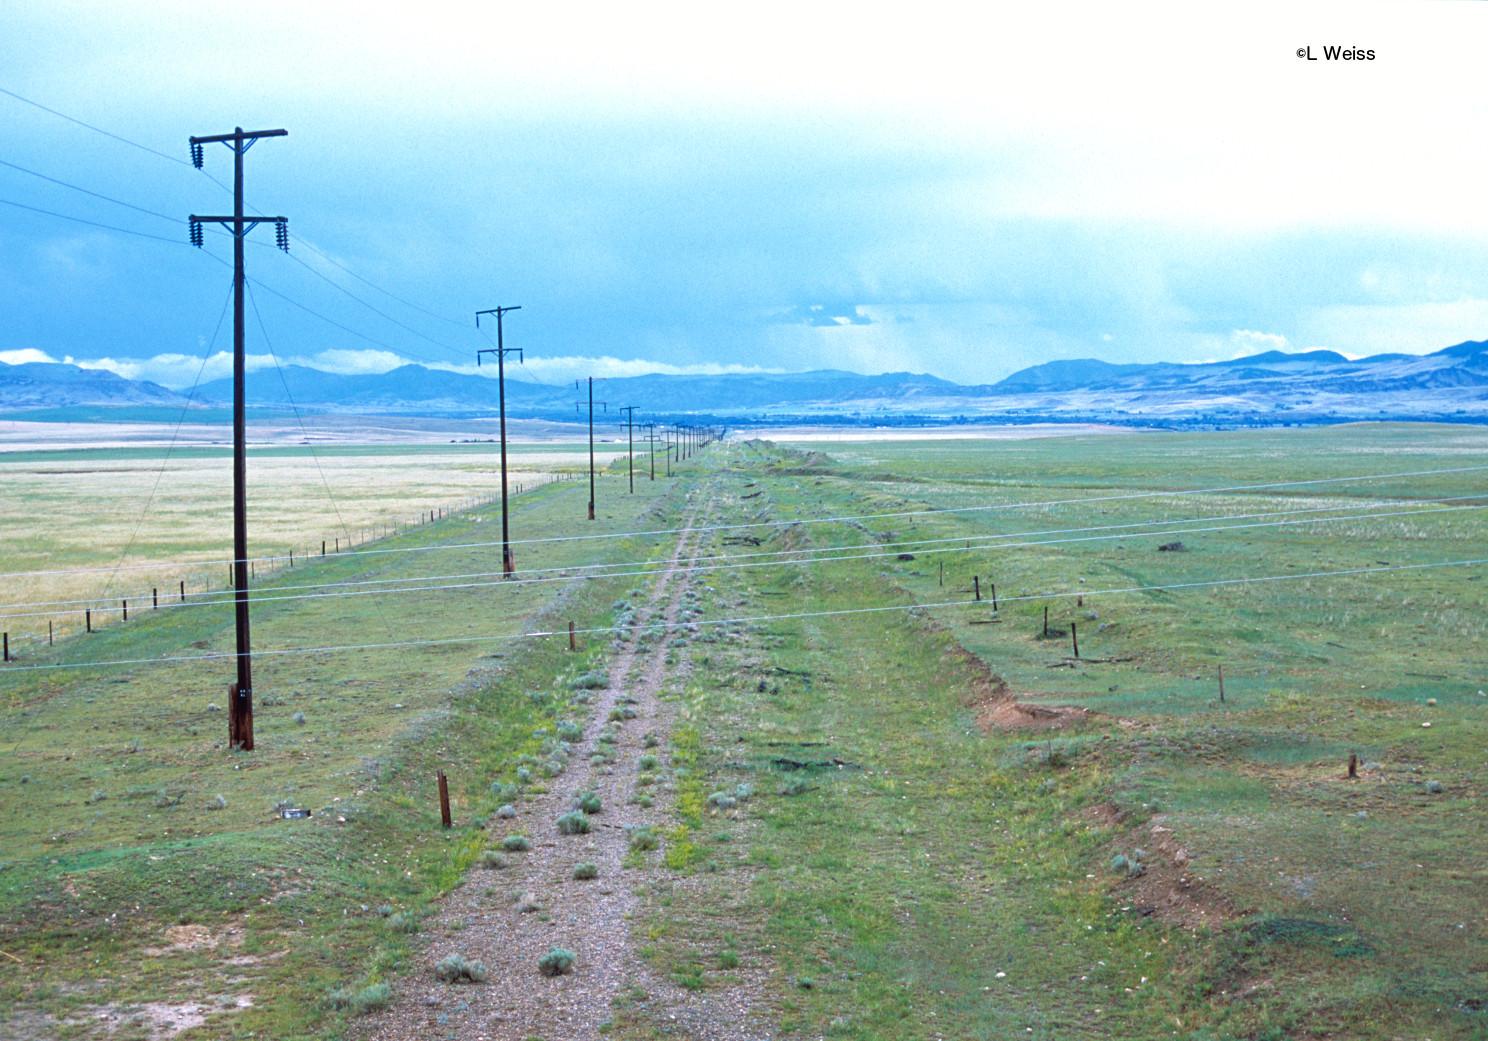 1489 7 VendomeLoop East sm - Electric Railroad through the Rockies